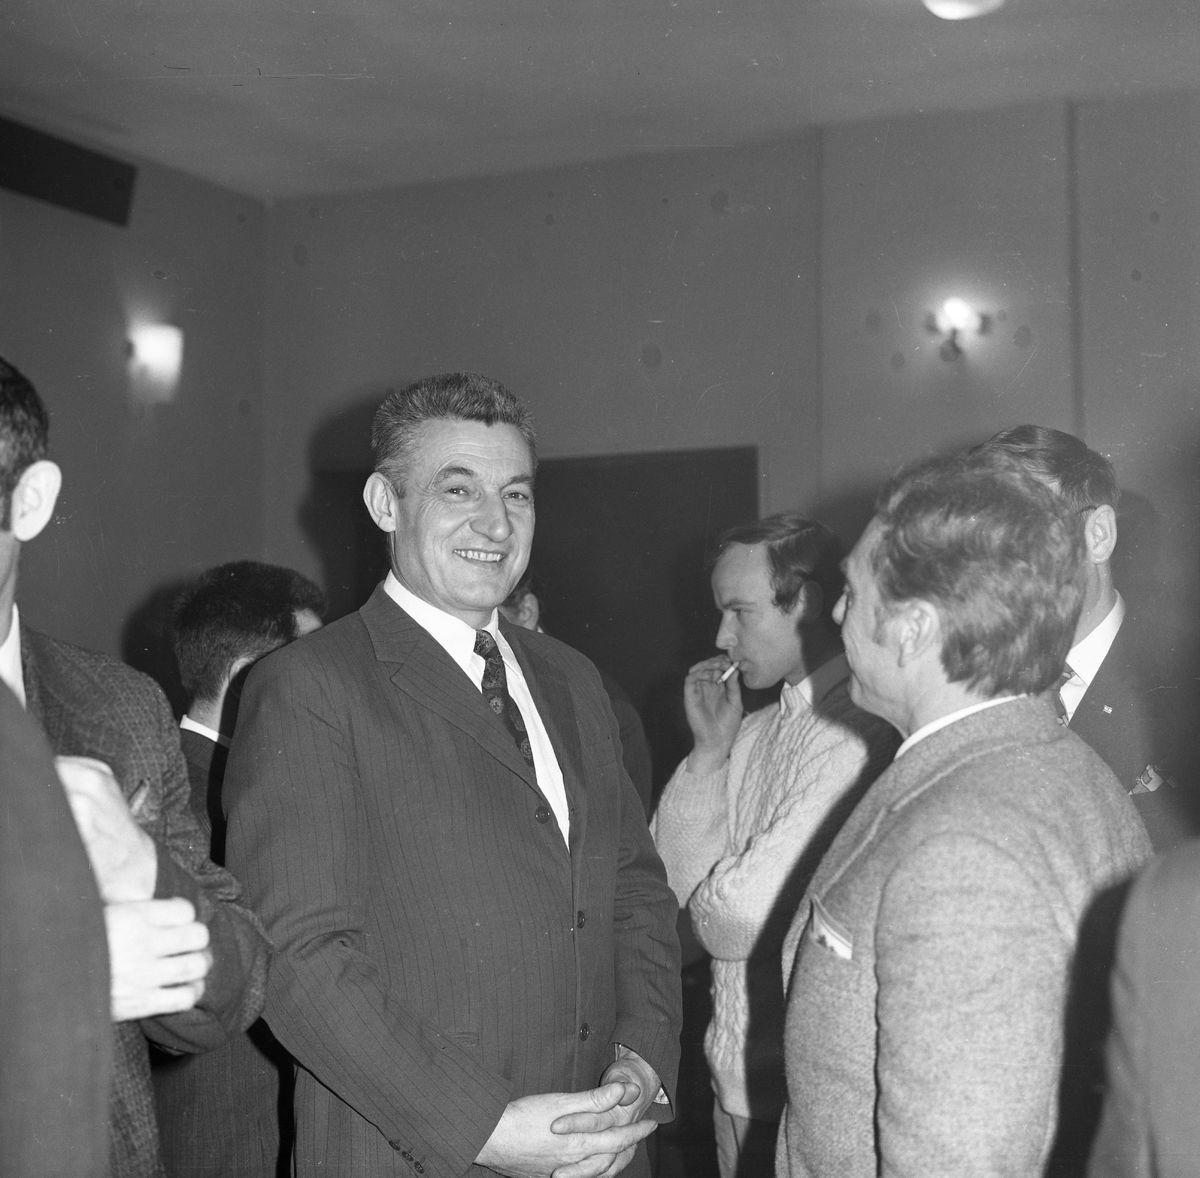 Spotkanie partyjne, 1974 r. [1]